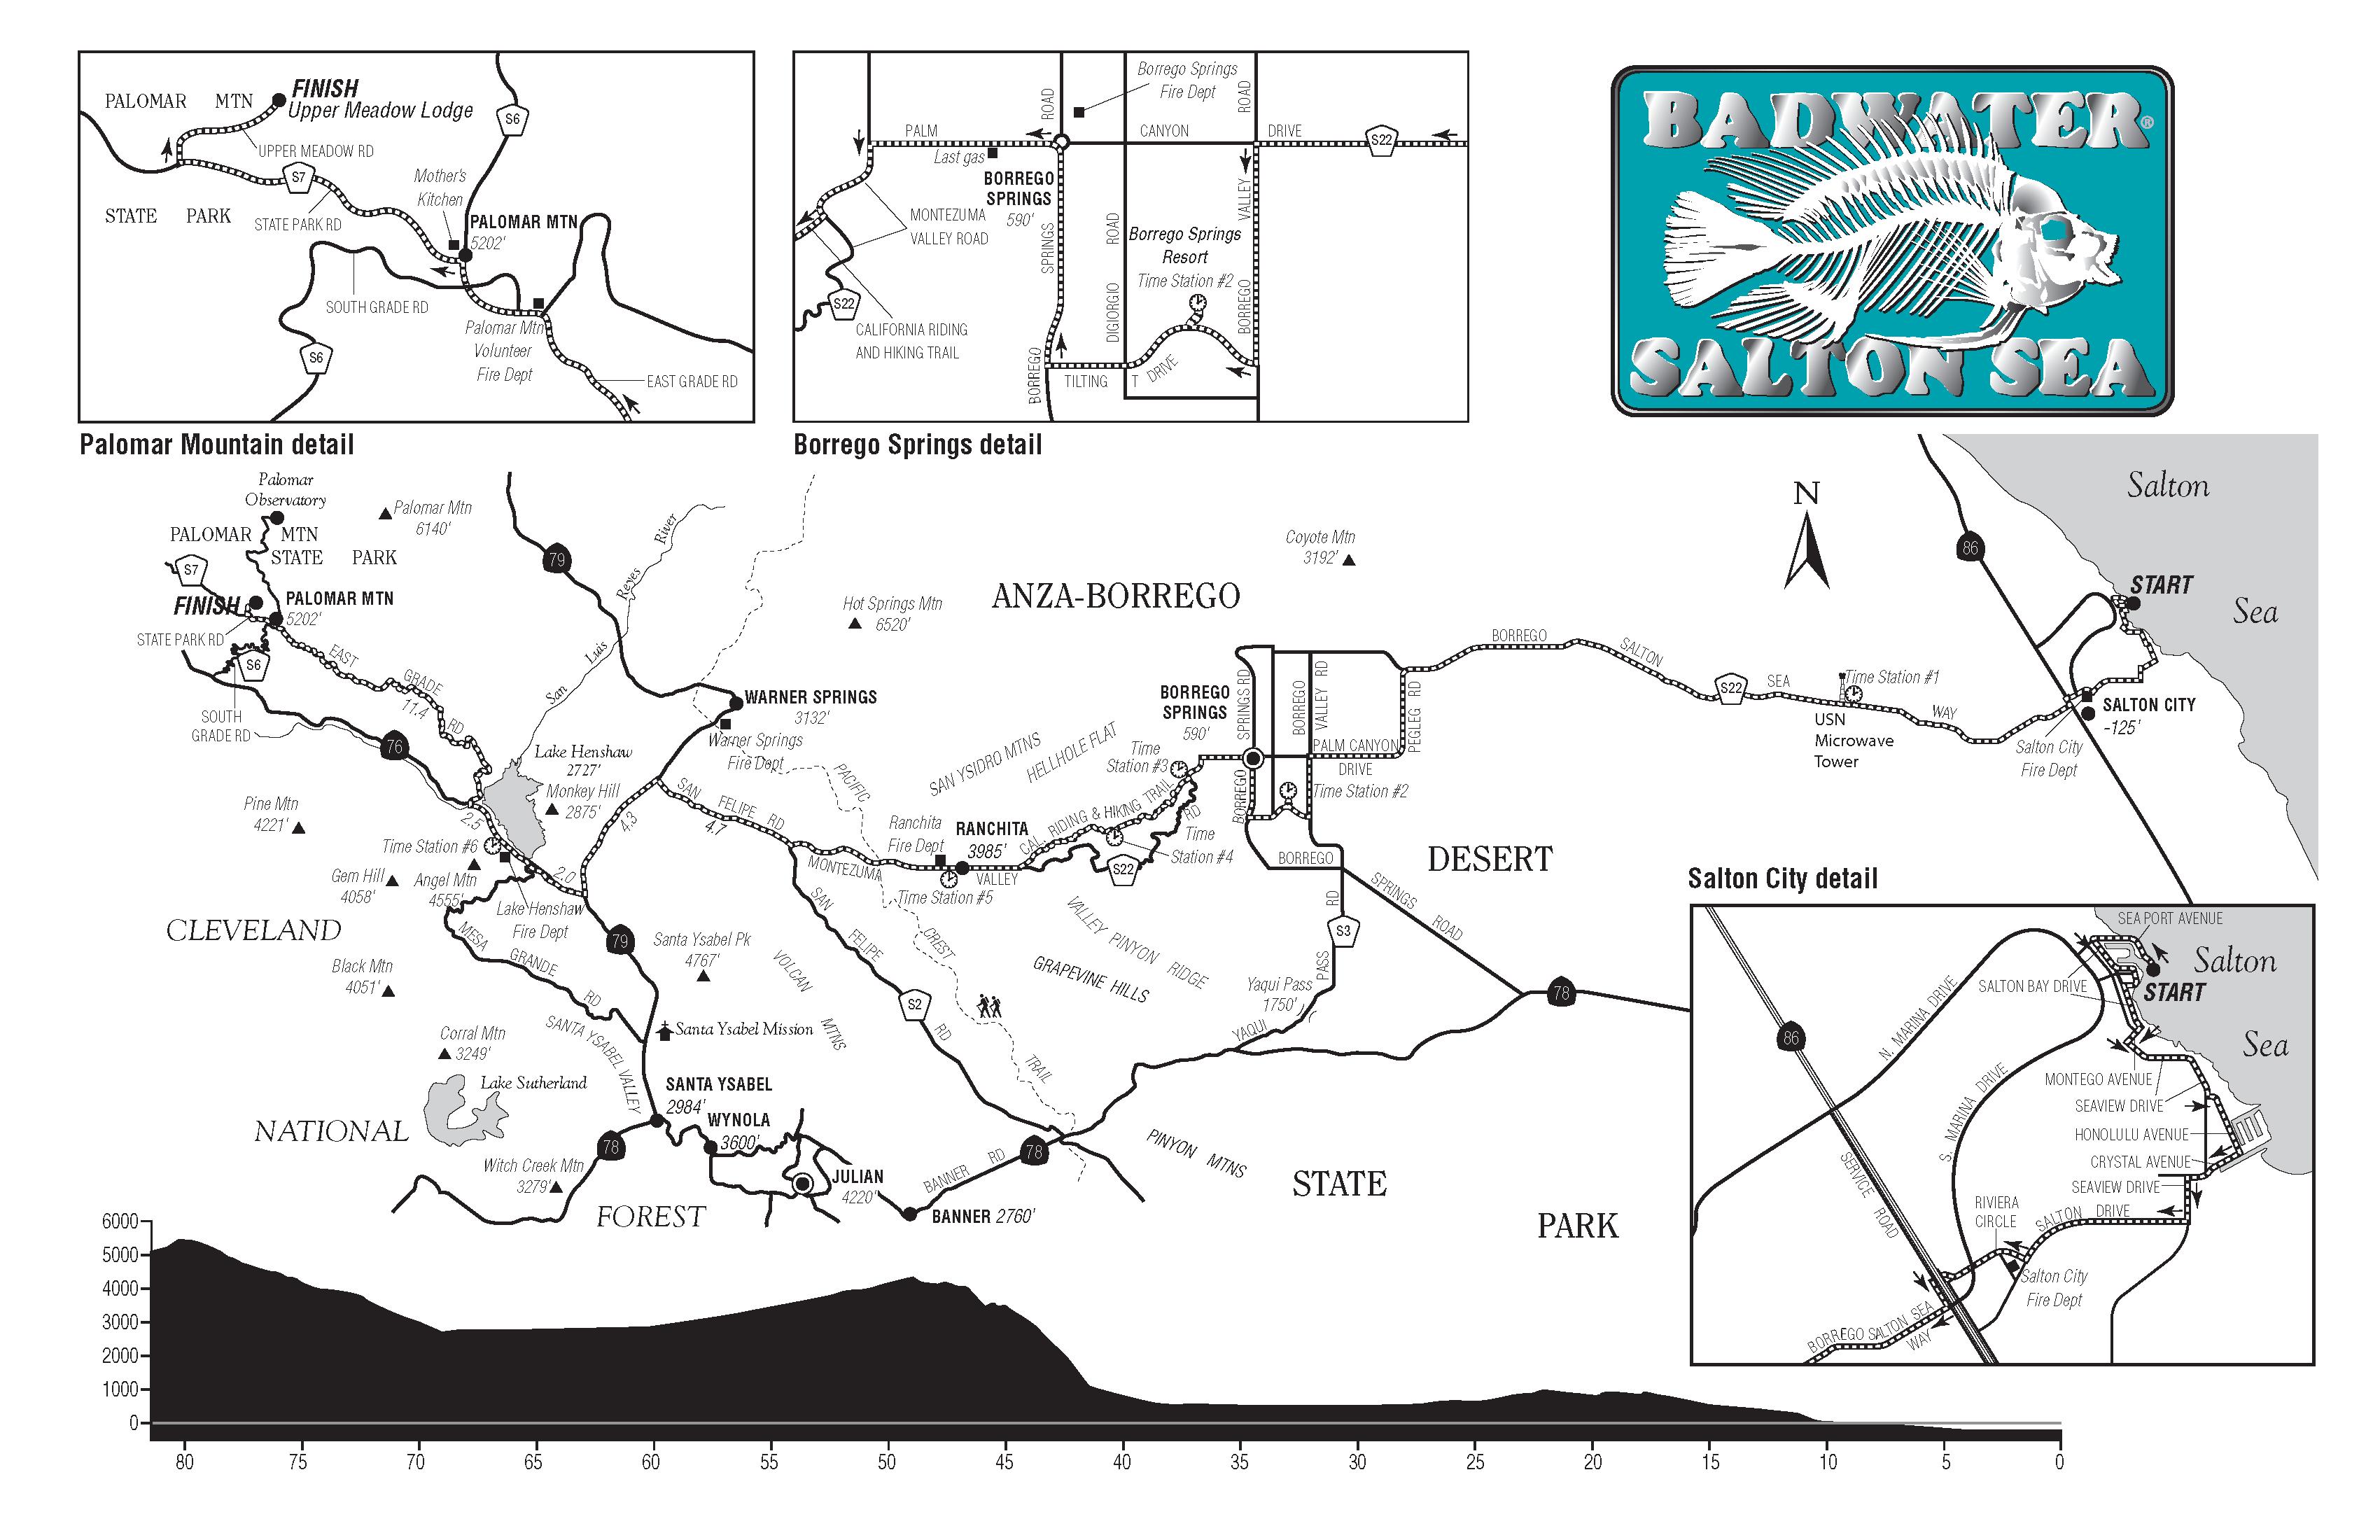 SaltonSea-PalomarMAP